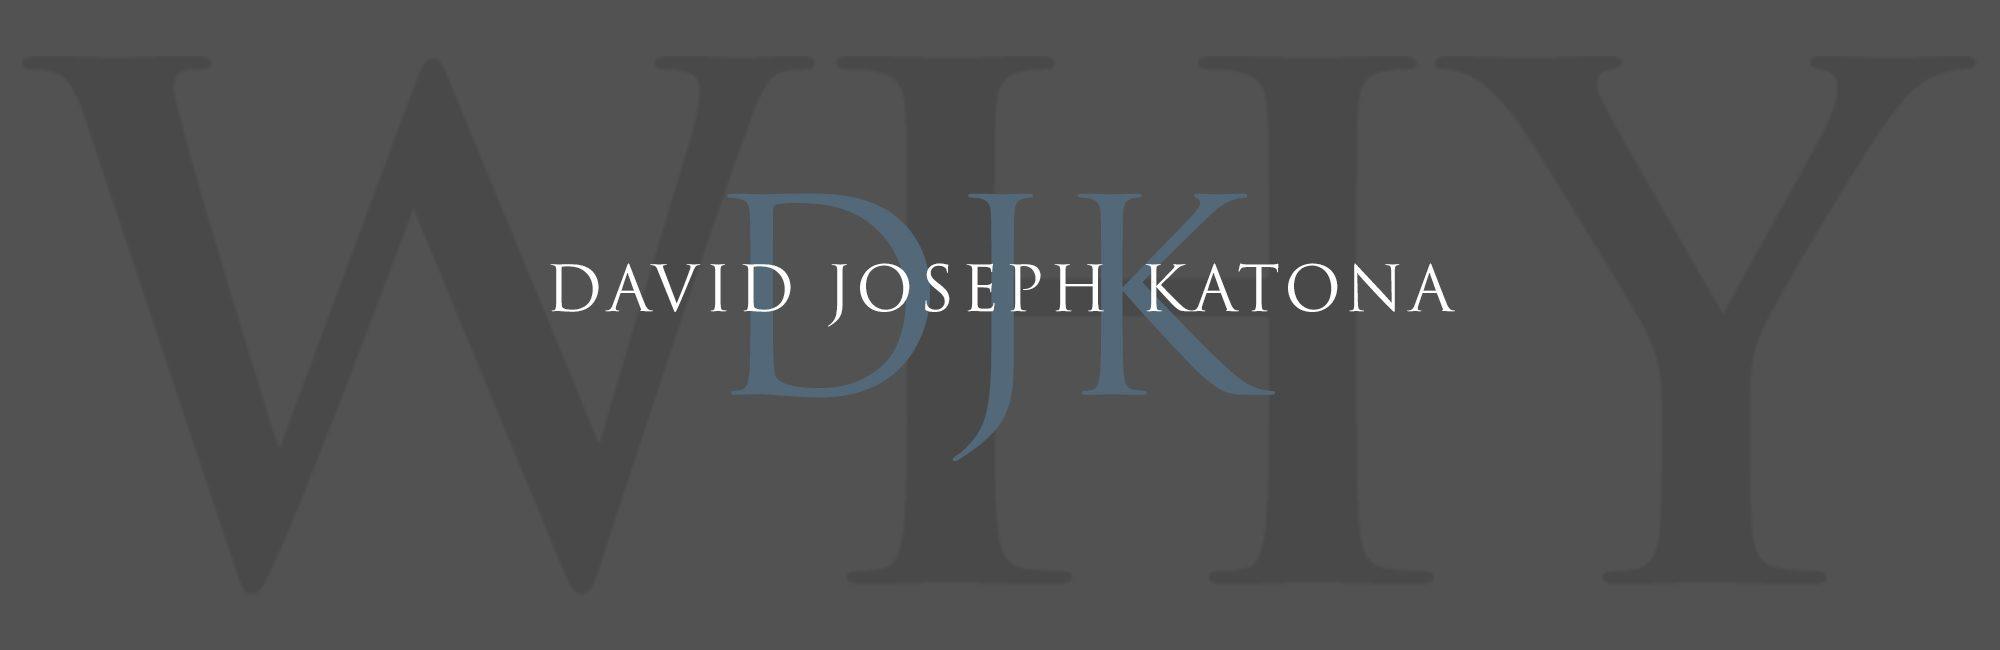 David Joseph Katona Interior Design Banner